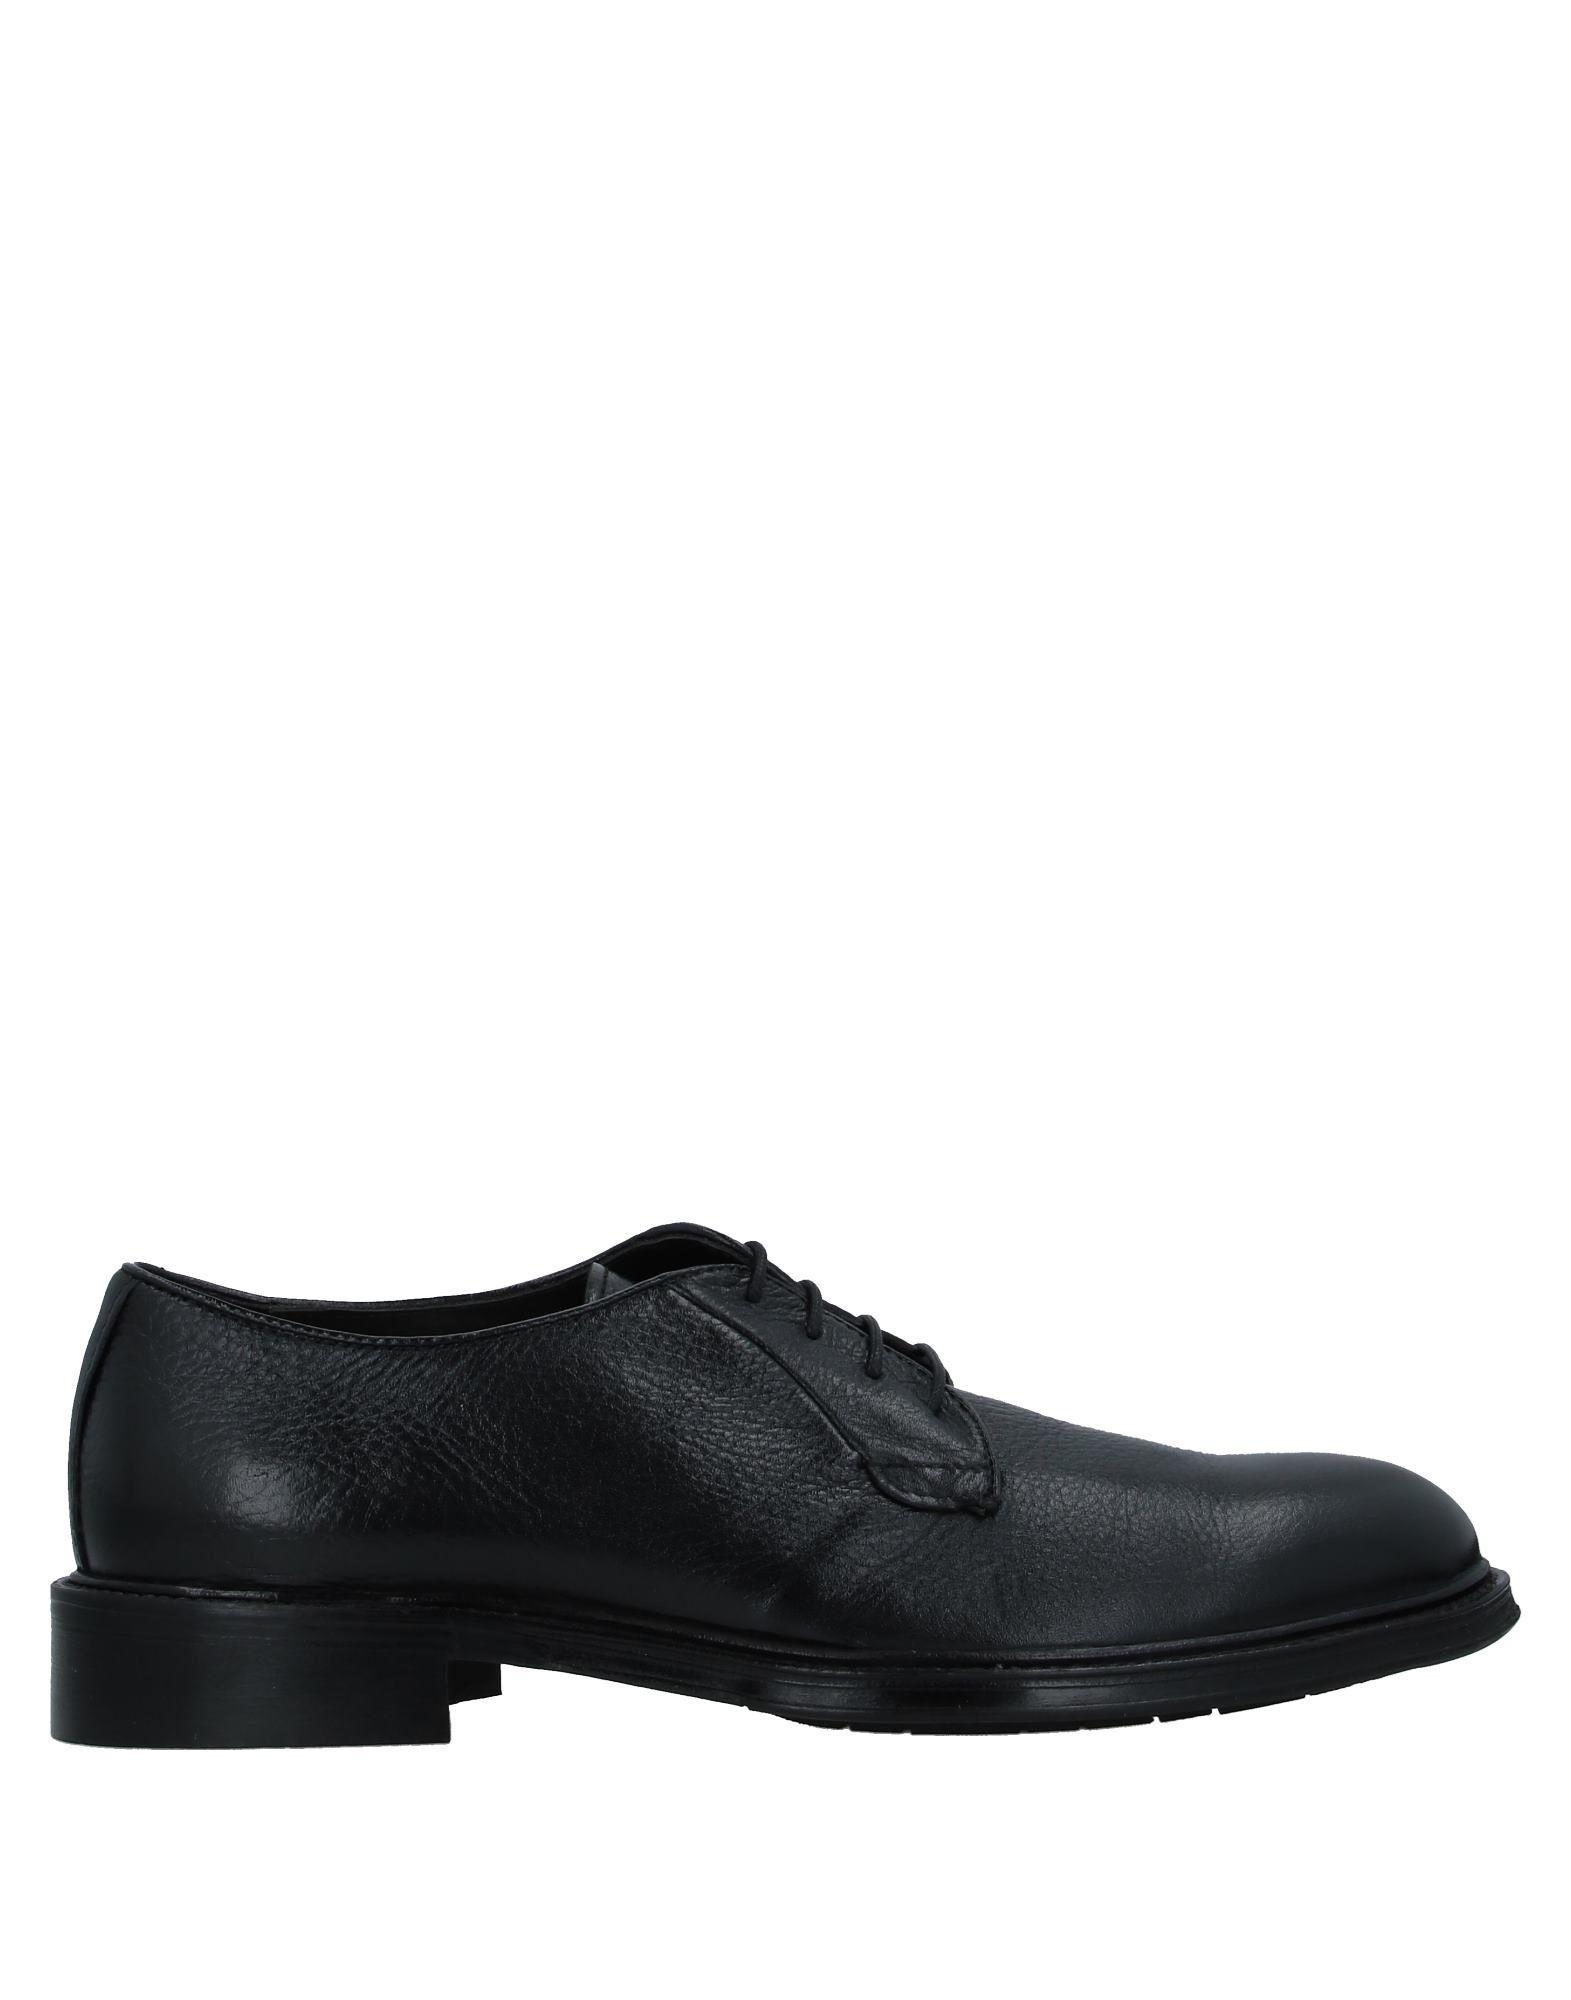 JOHN CROCE Обувь на шнурках john spencer обувь на шнурках